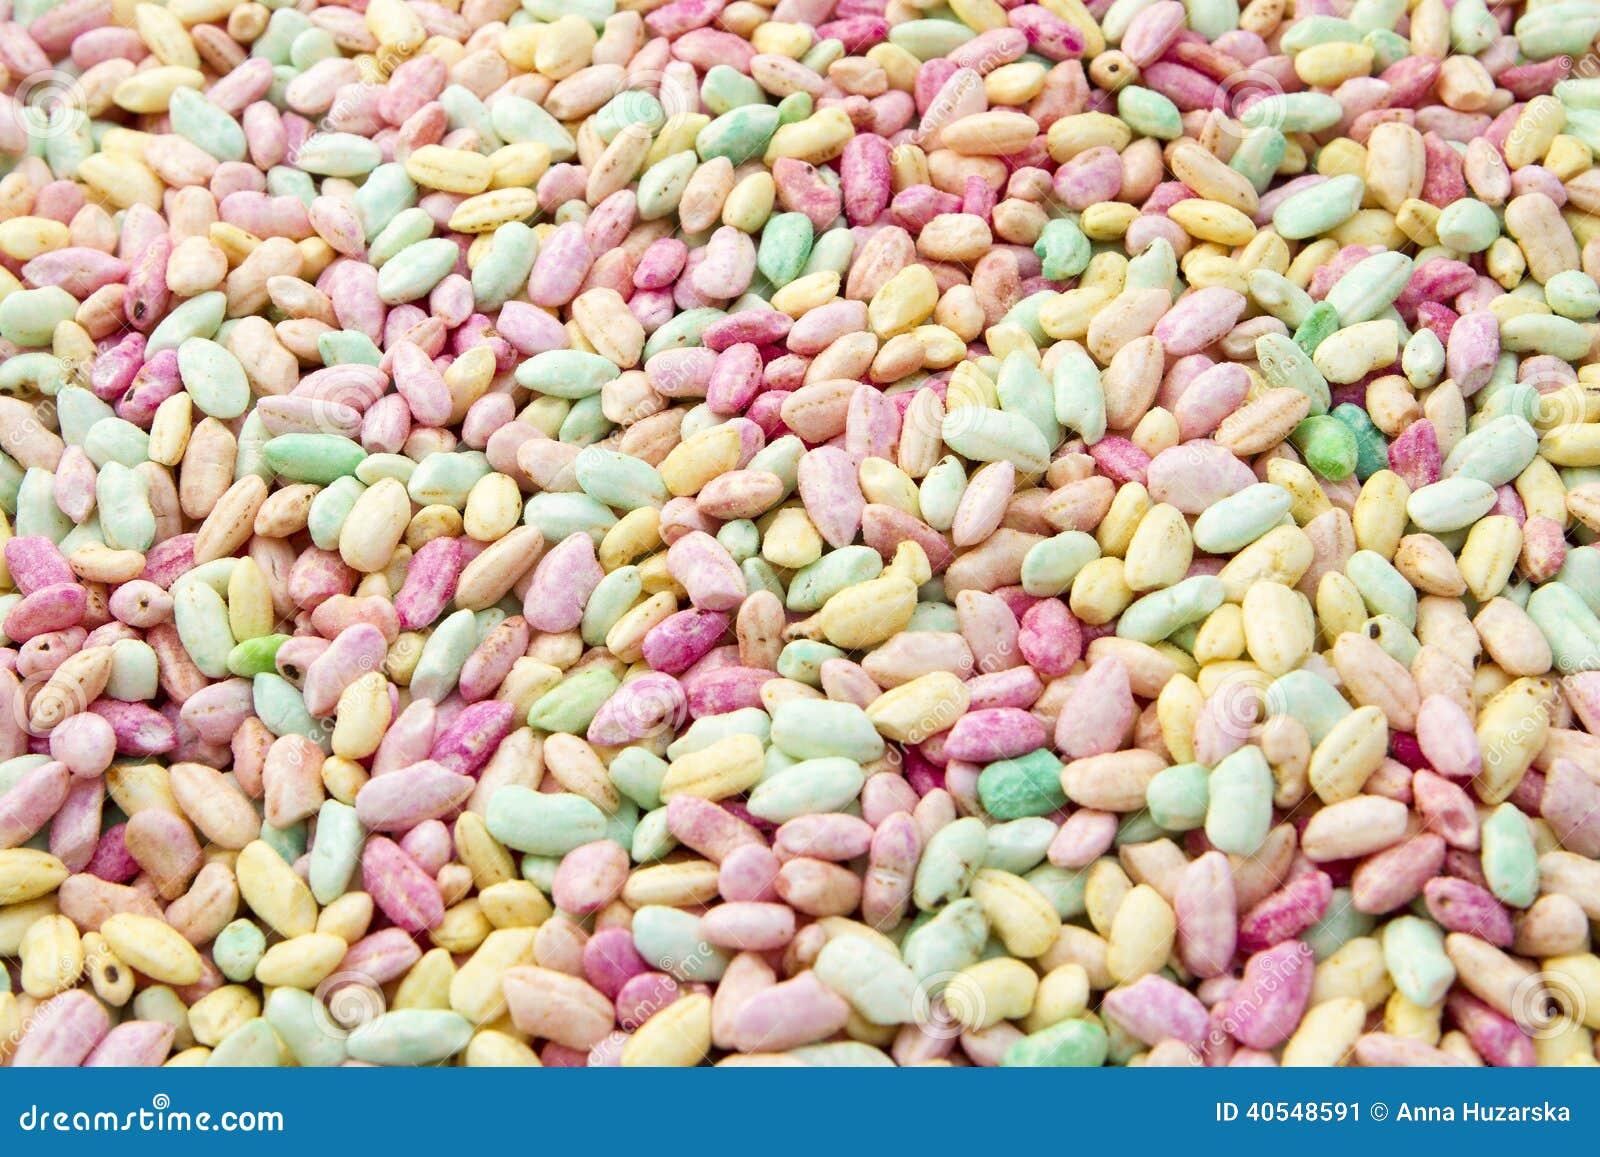 Arrozes tufados coloridos e doces